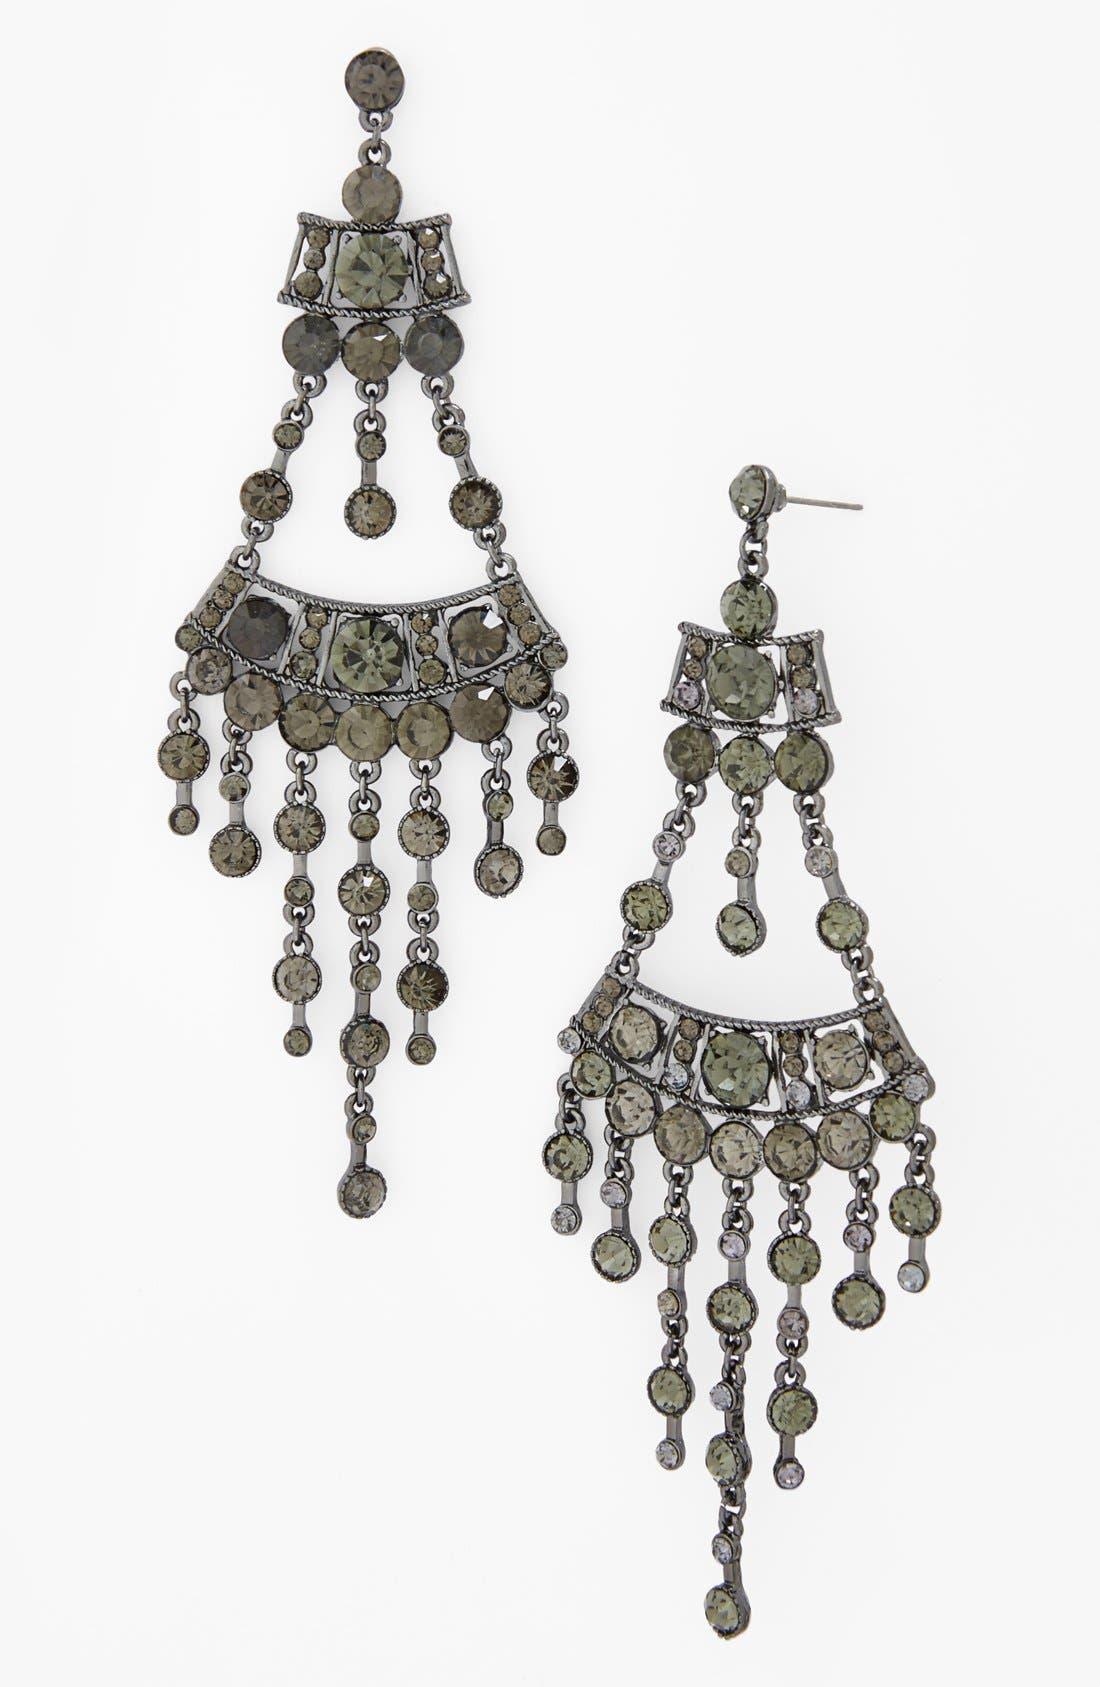 Alternate Image 1 Selected - Natasha Couture 'Drama' Chandelier Earrings